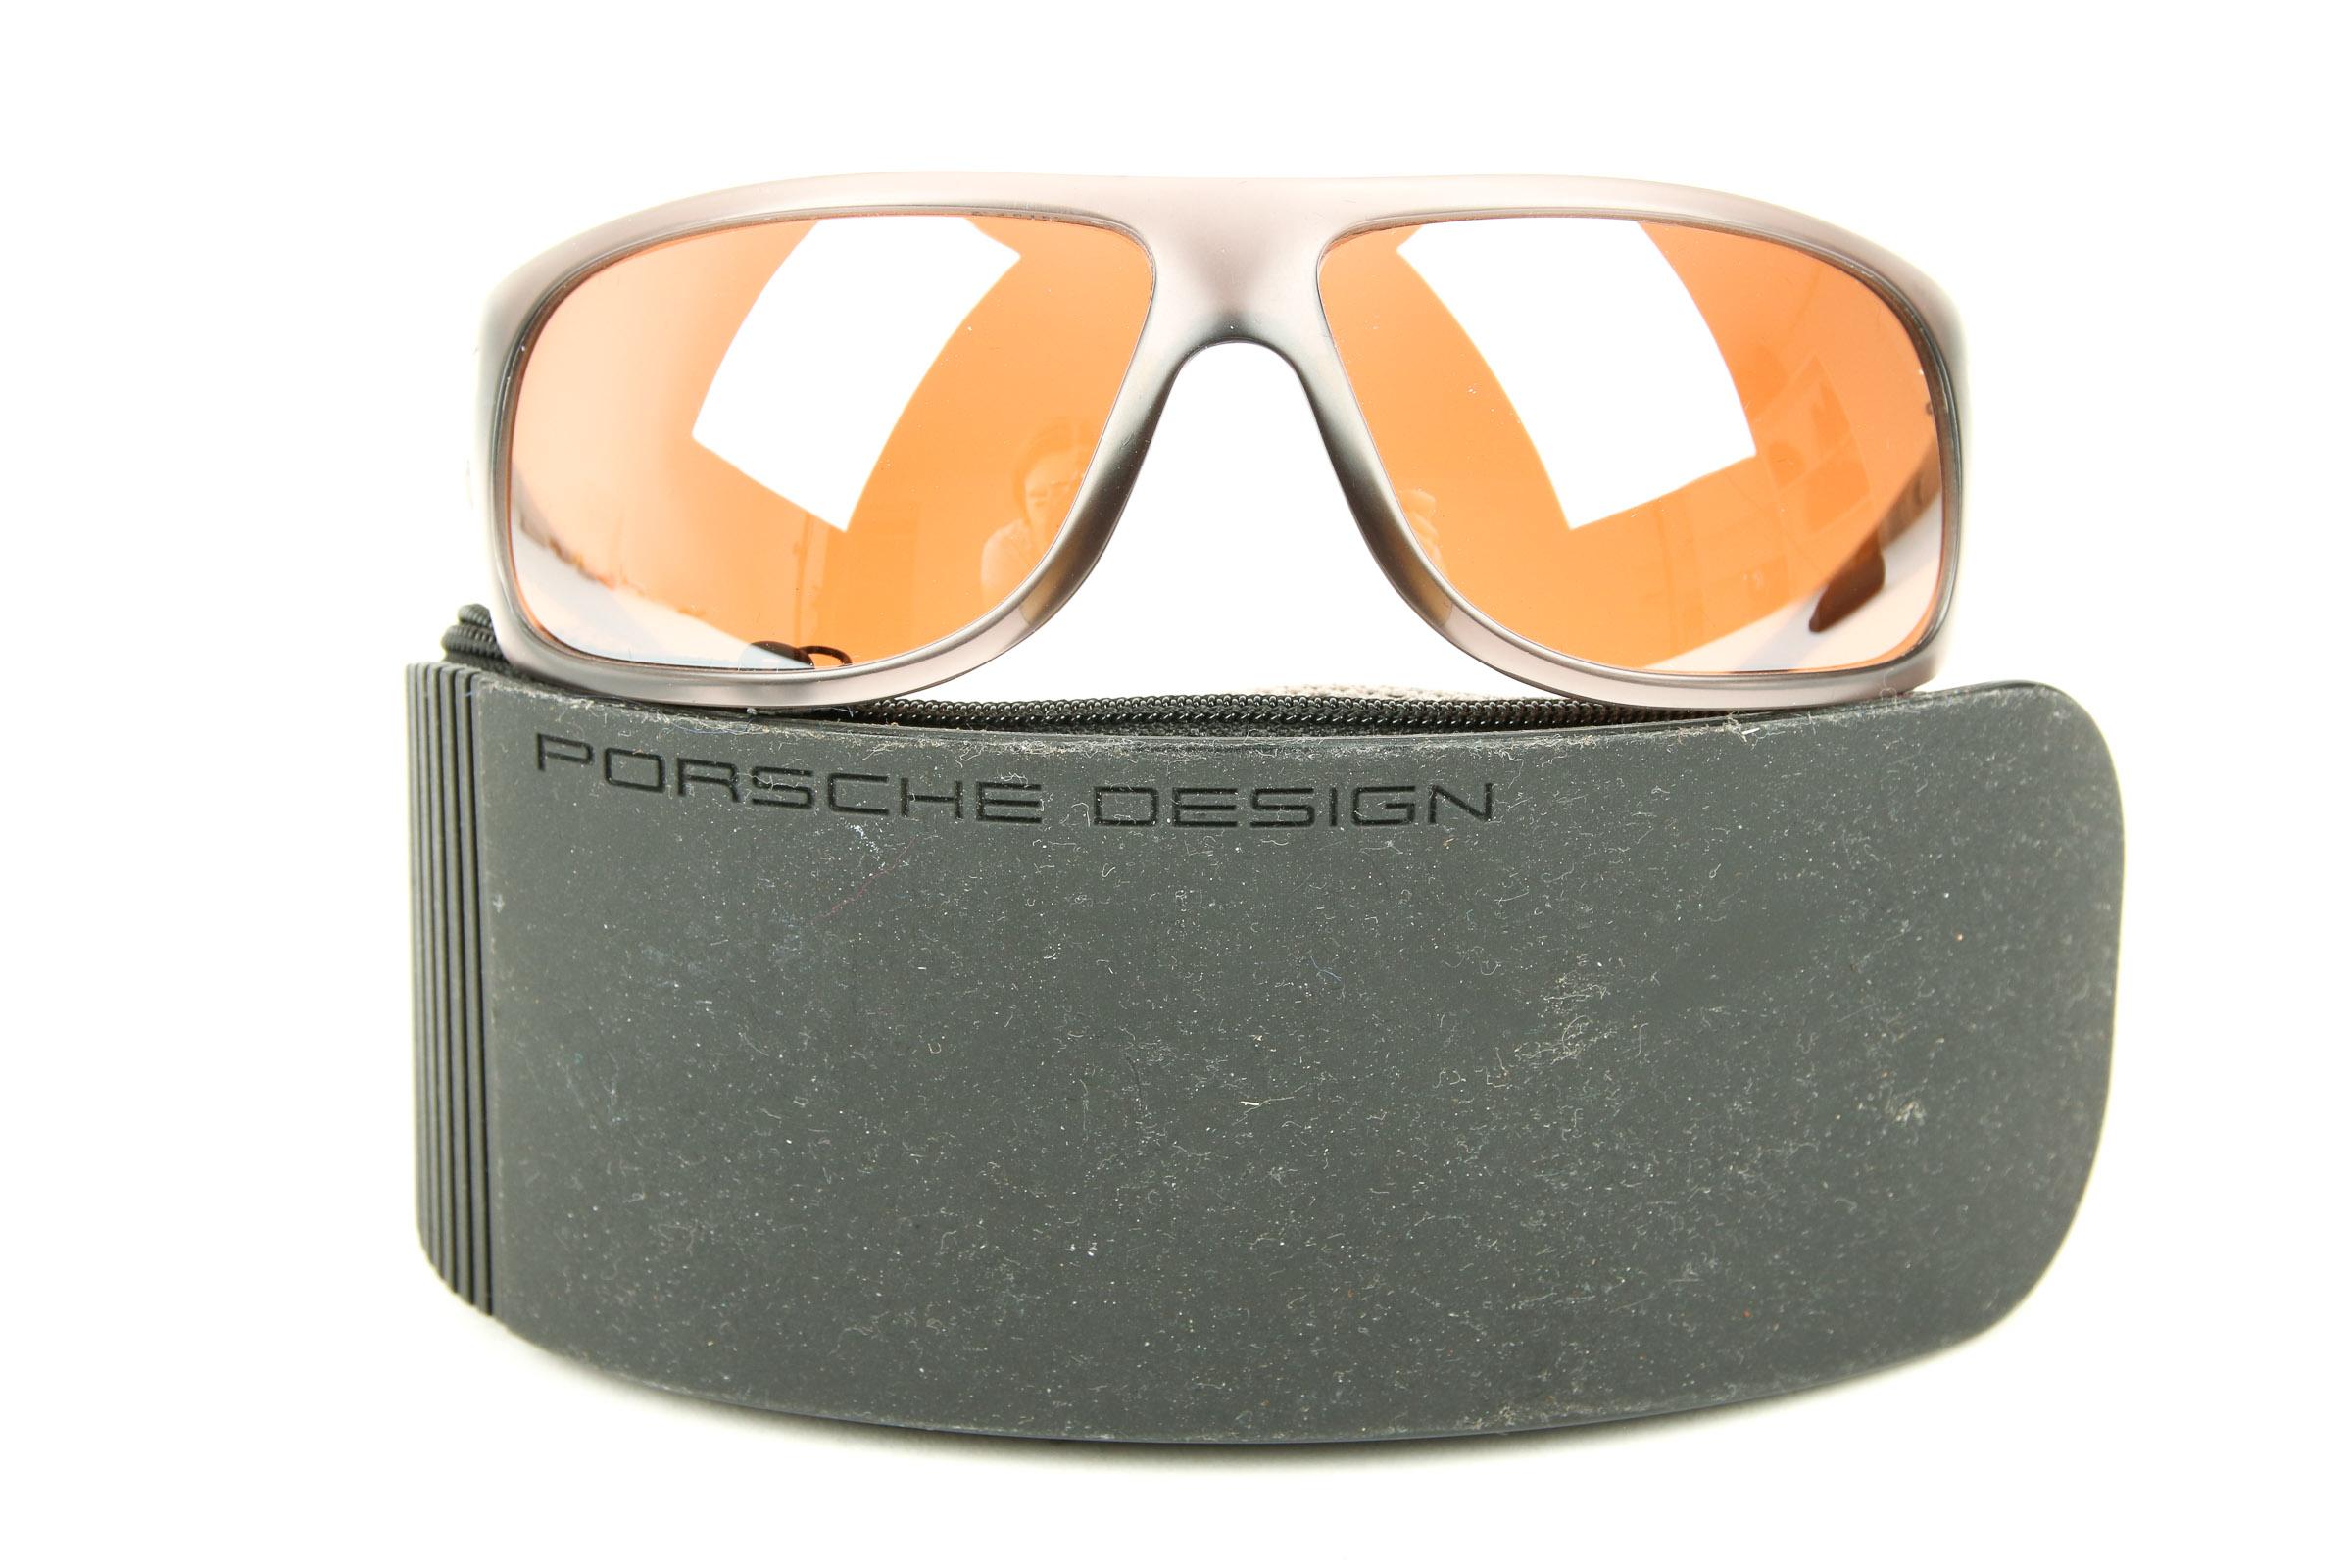 porsche design handtaschen accessoires. Black Bedroom Furniture Sets. Home Design Ideas